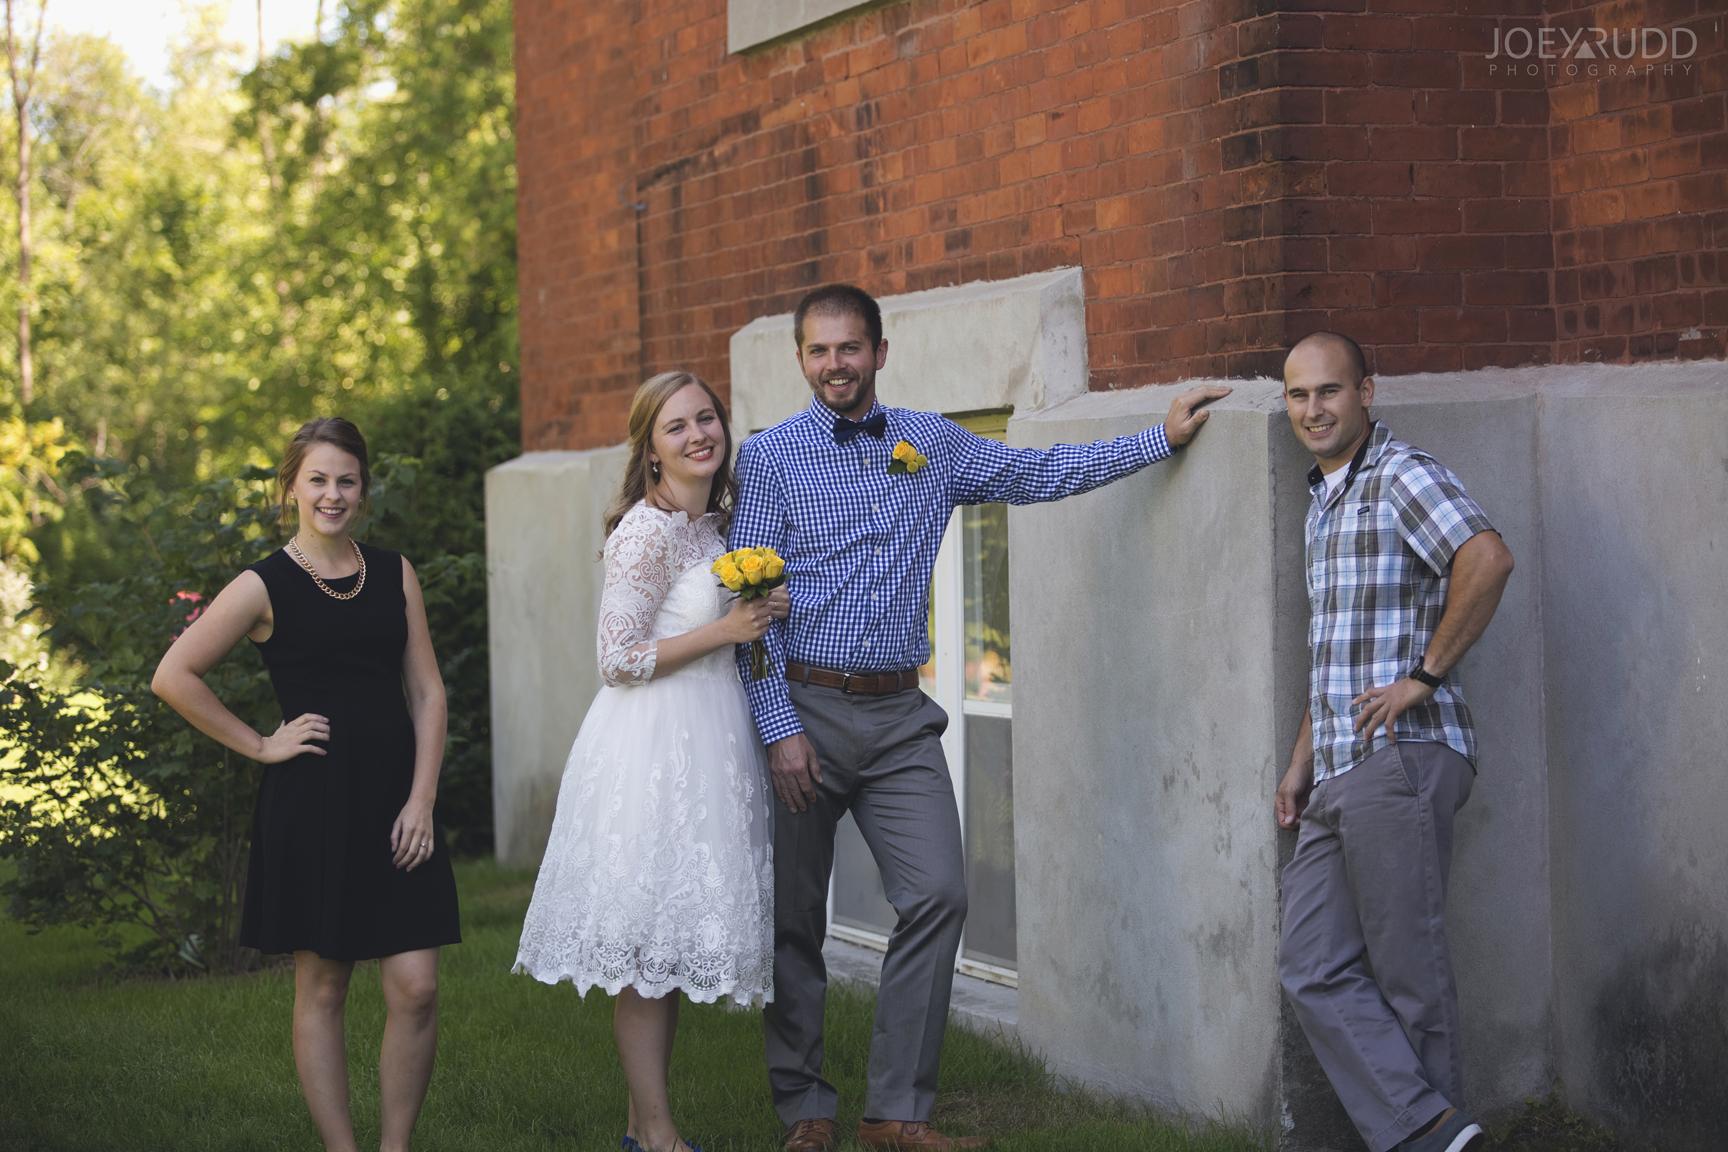 Ottawa Elopement by Joey Rudd Photography Ottawa Wedding Photographer Mer Bleue Ottawa Wedding Chapel Wedding Party Church